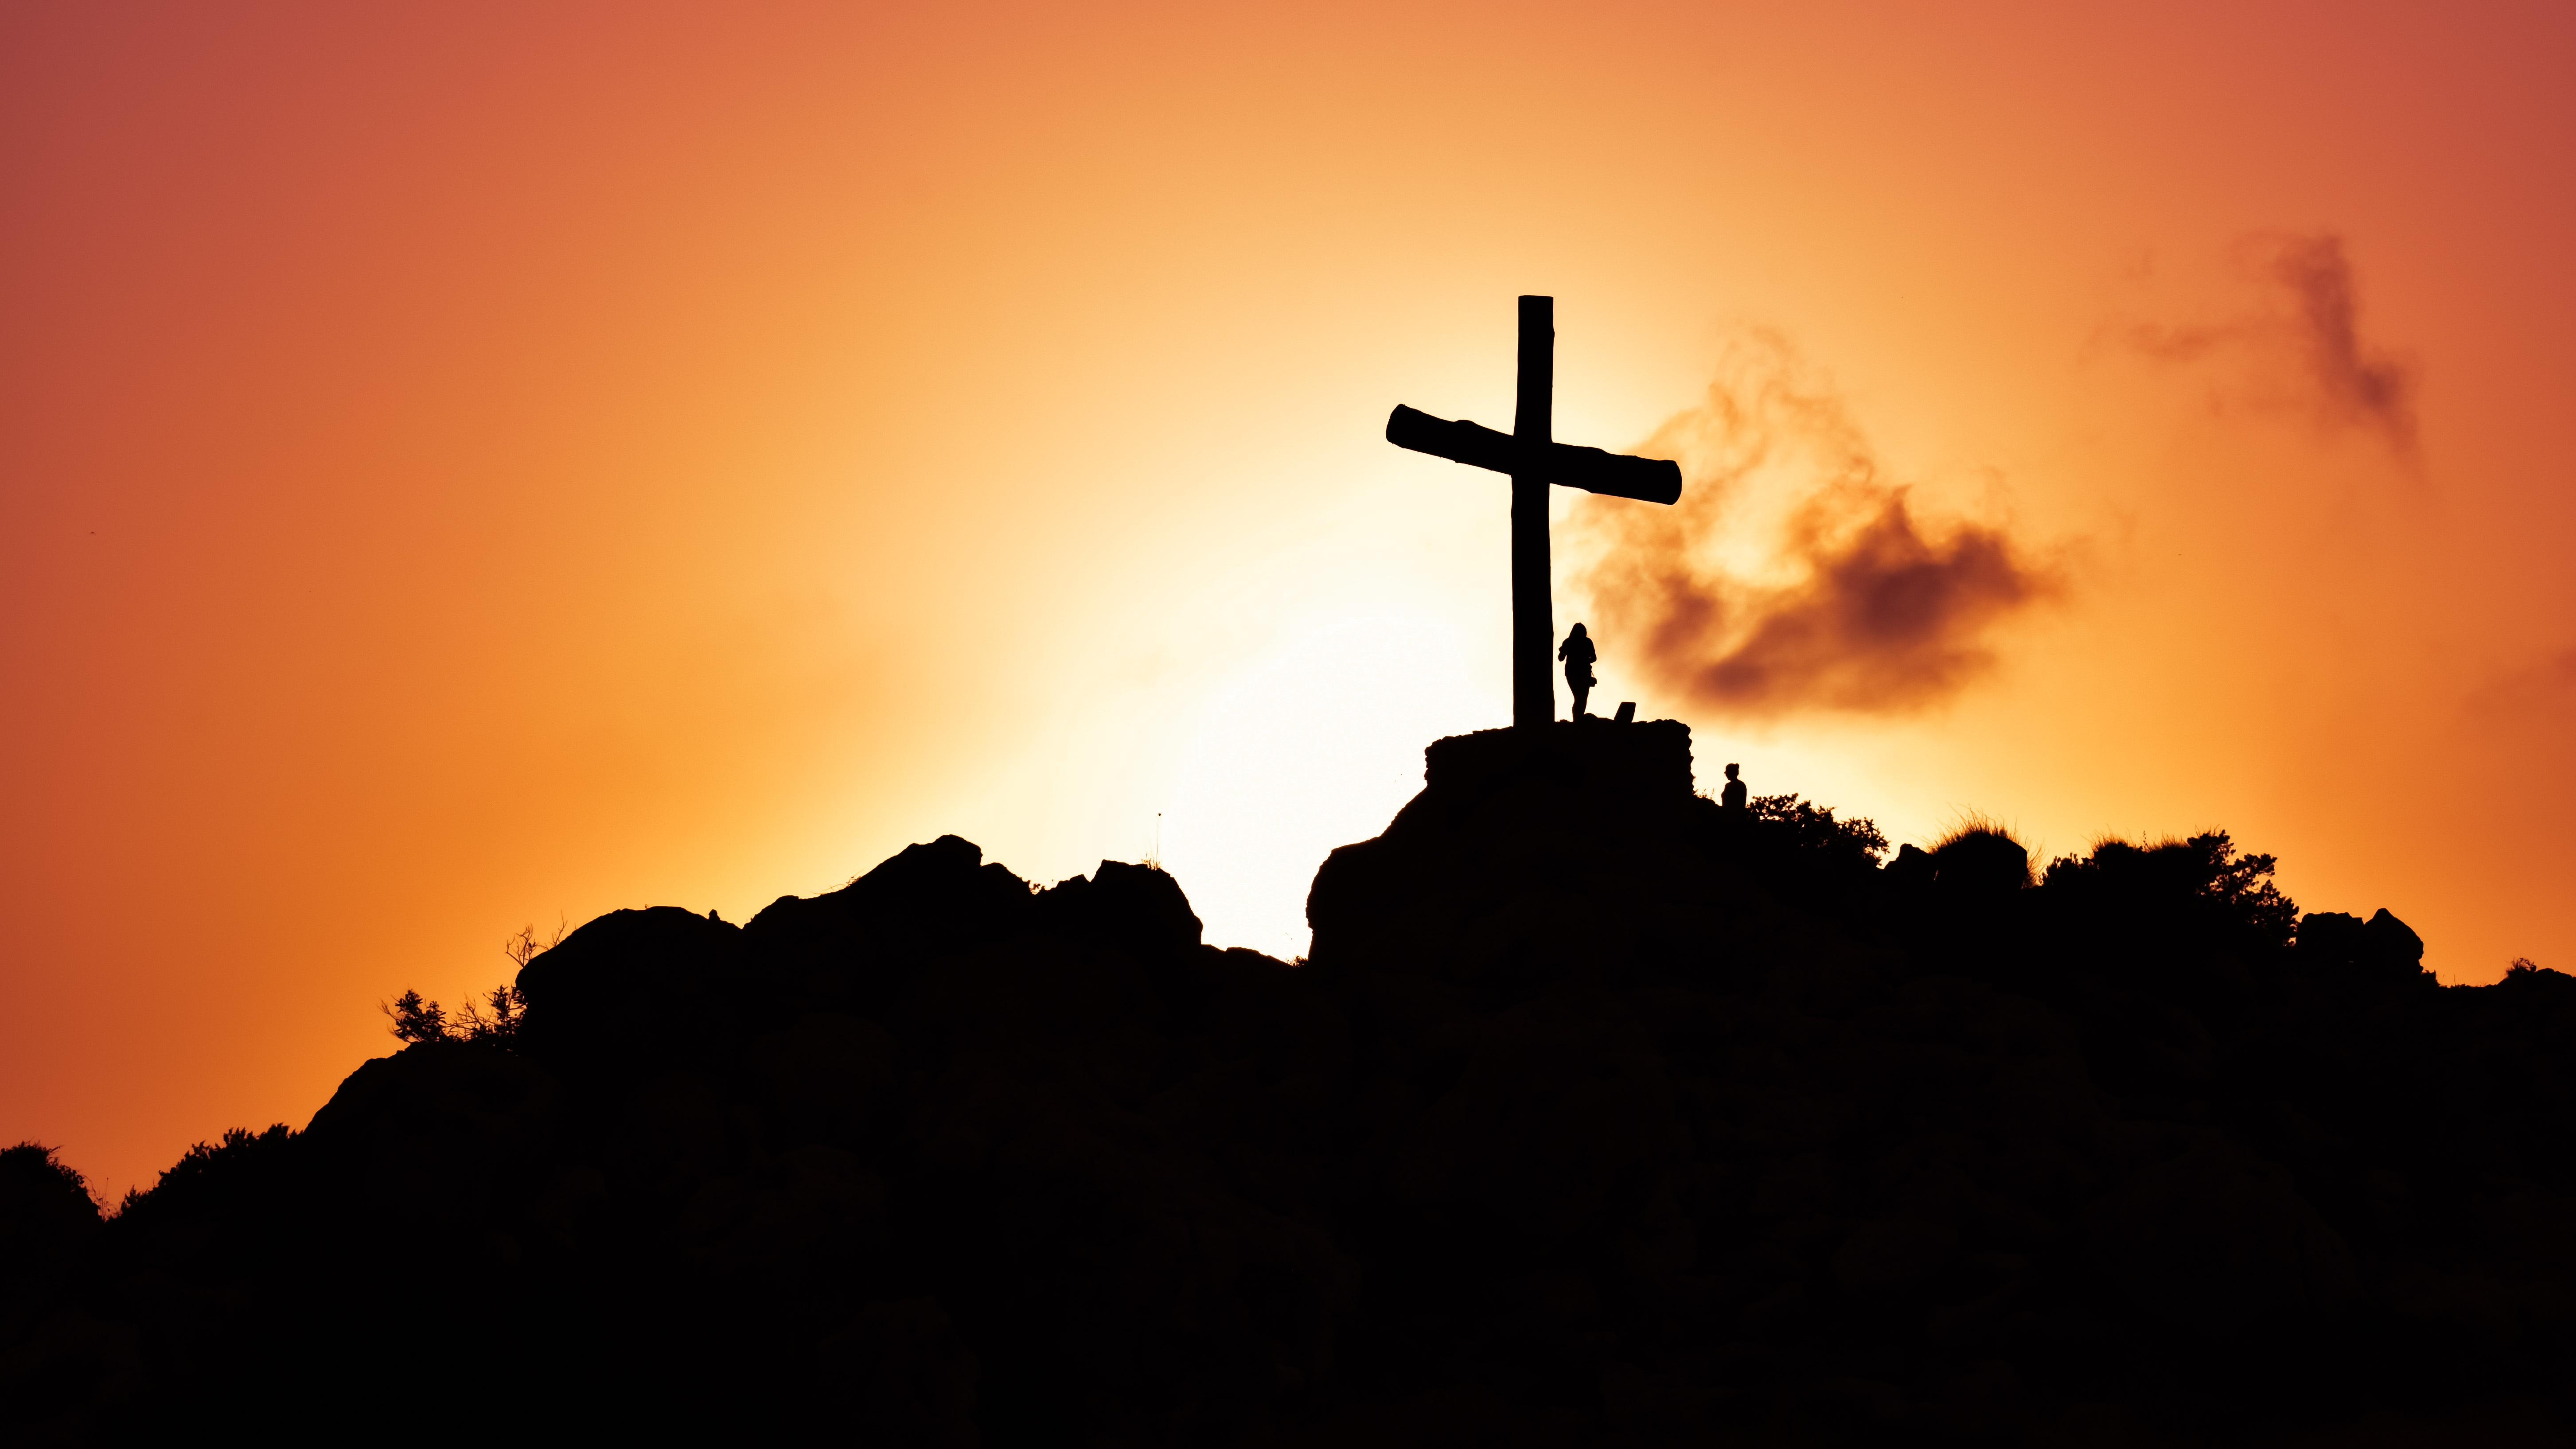 The Gospel: A Message Worth Preaching (1 Corinthians 15:1-11)